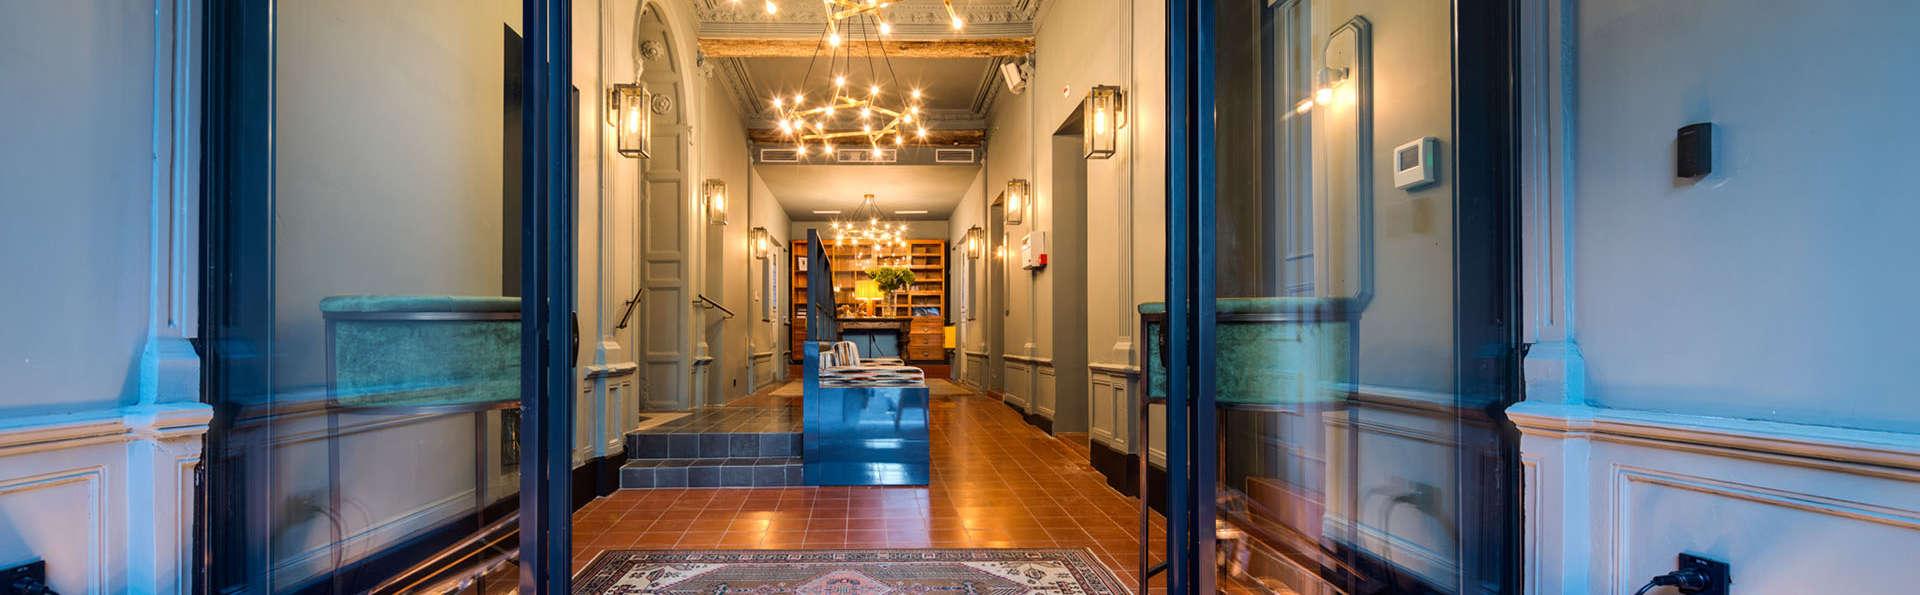 Hotel Monastere Maastricht - EDIT_LucasKemper_Monaste_re_reception-30LR.jpg